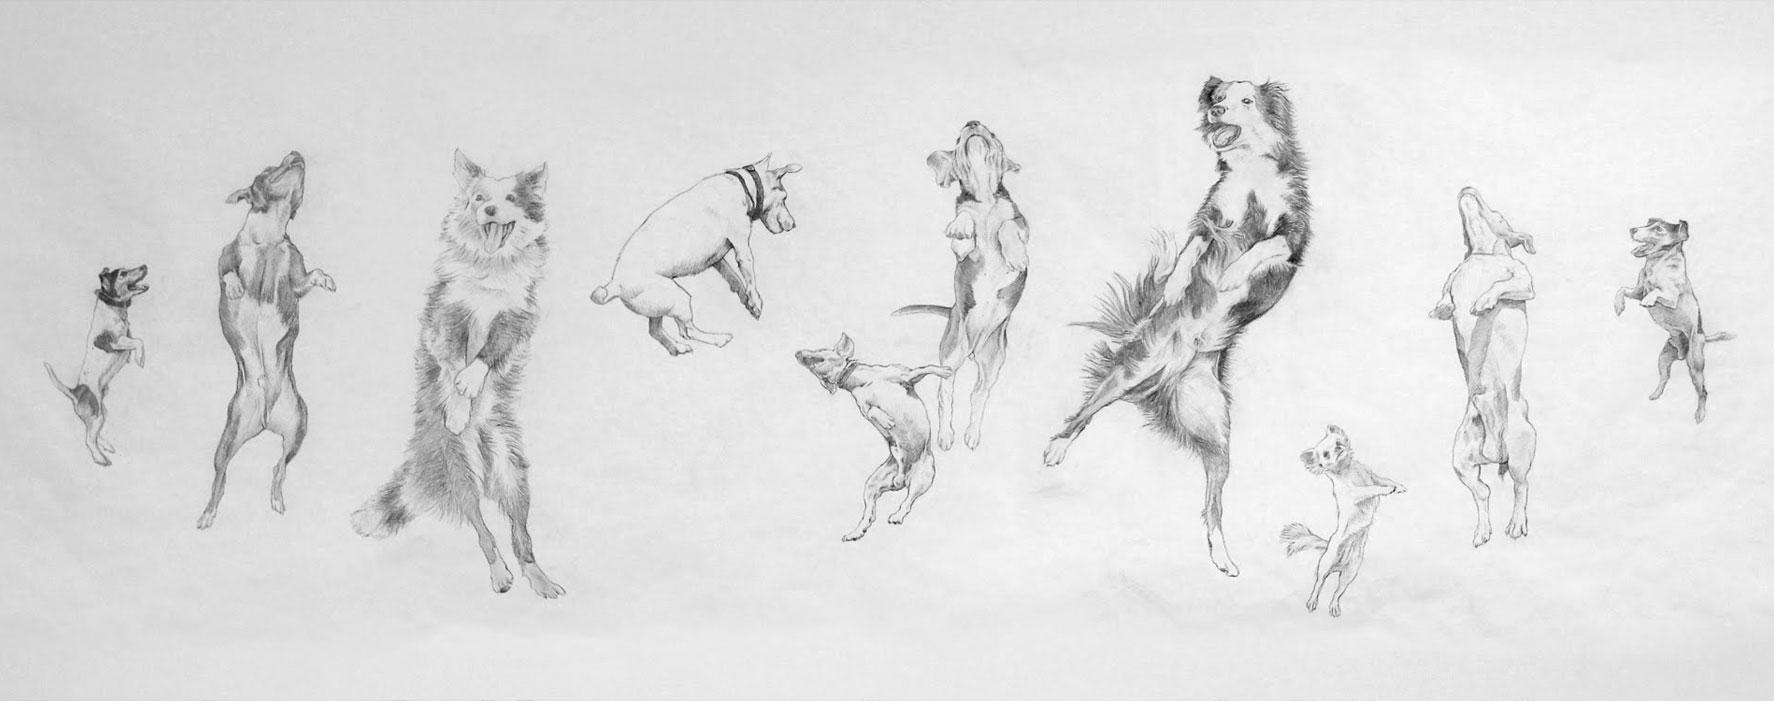 eugenio-rivas-jumping-dogs